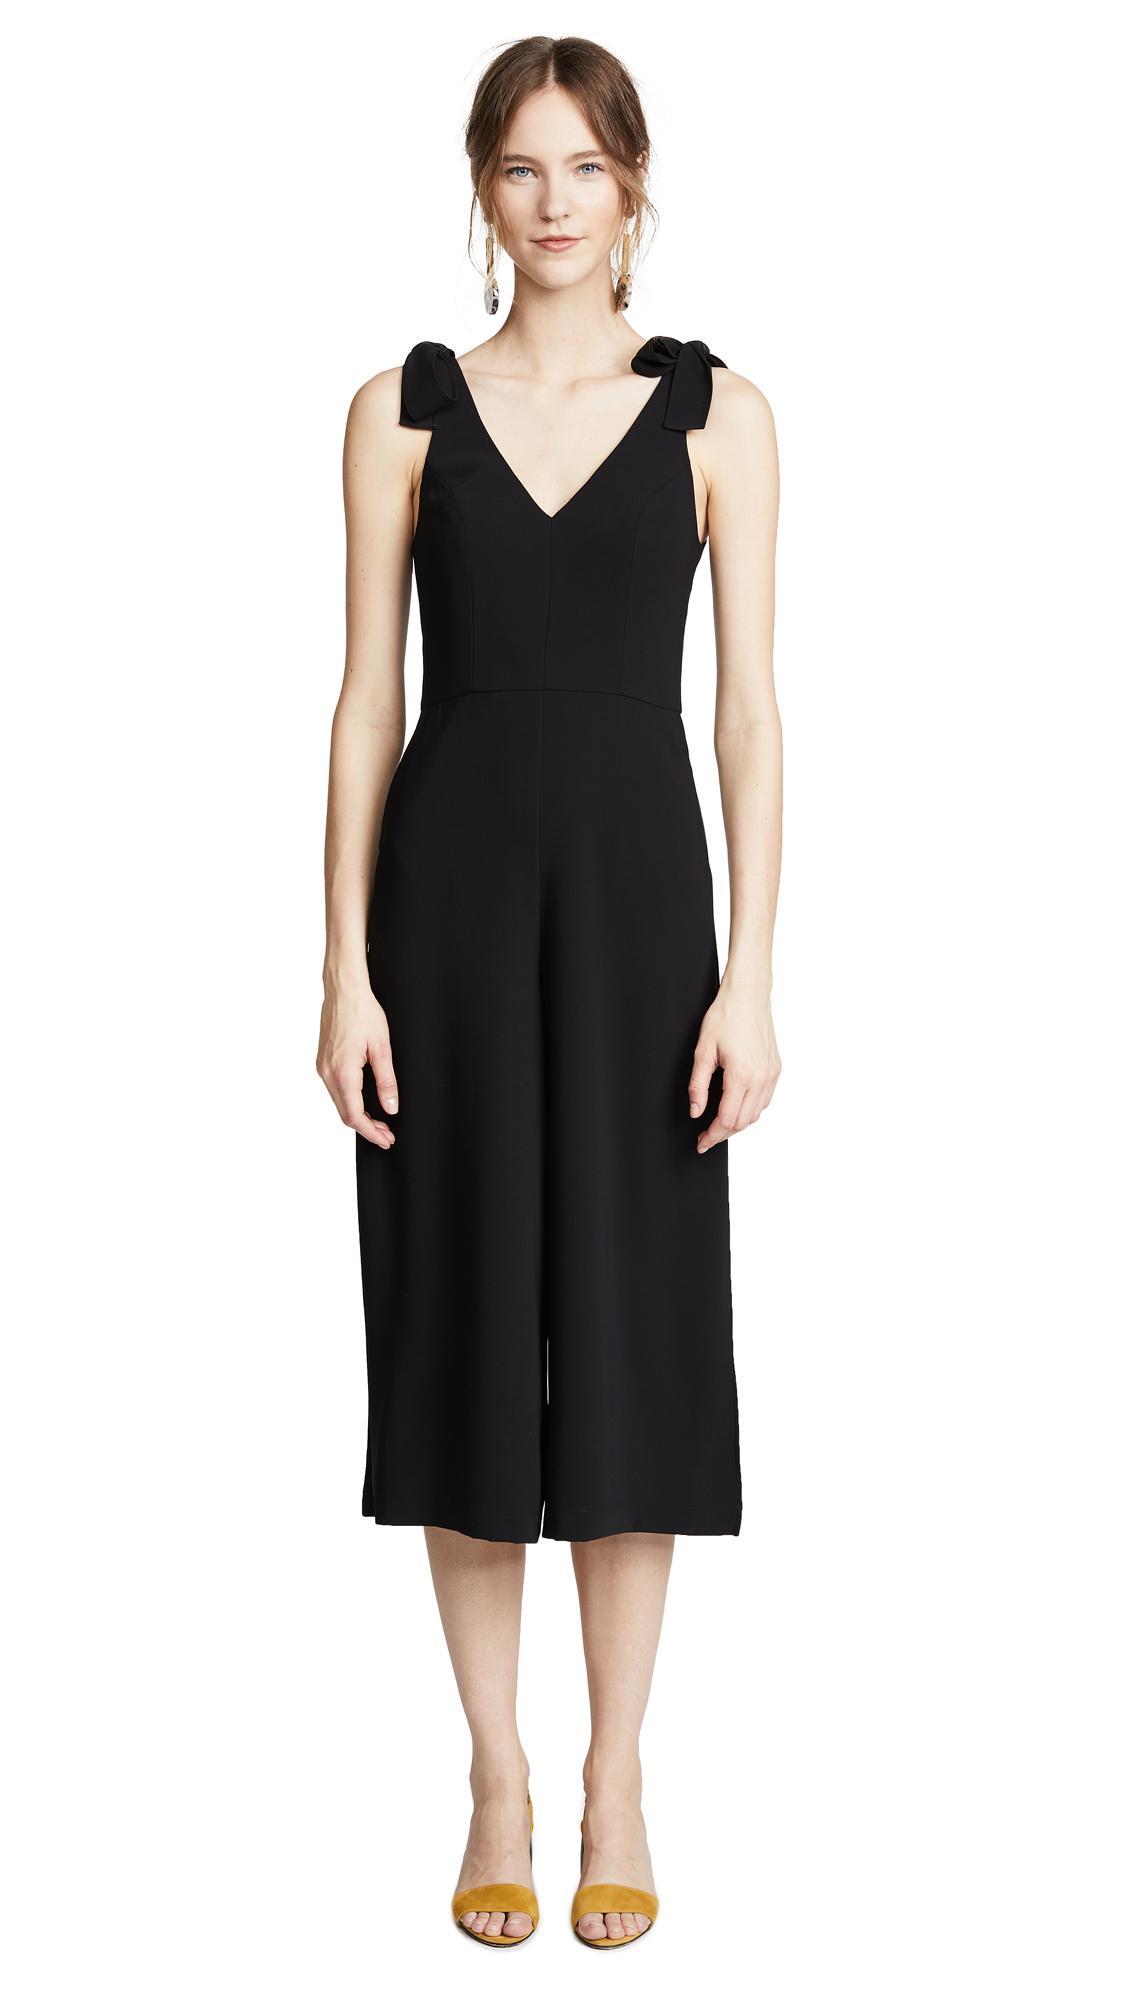 c265382174e0 Amanda Uprichard Iris Jumpsuit In Black